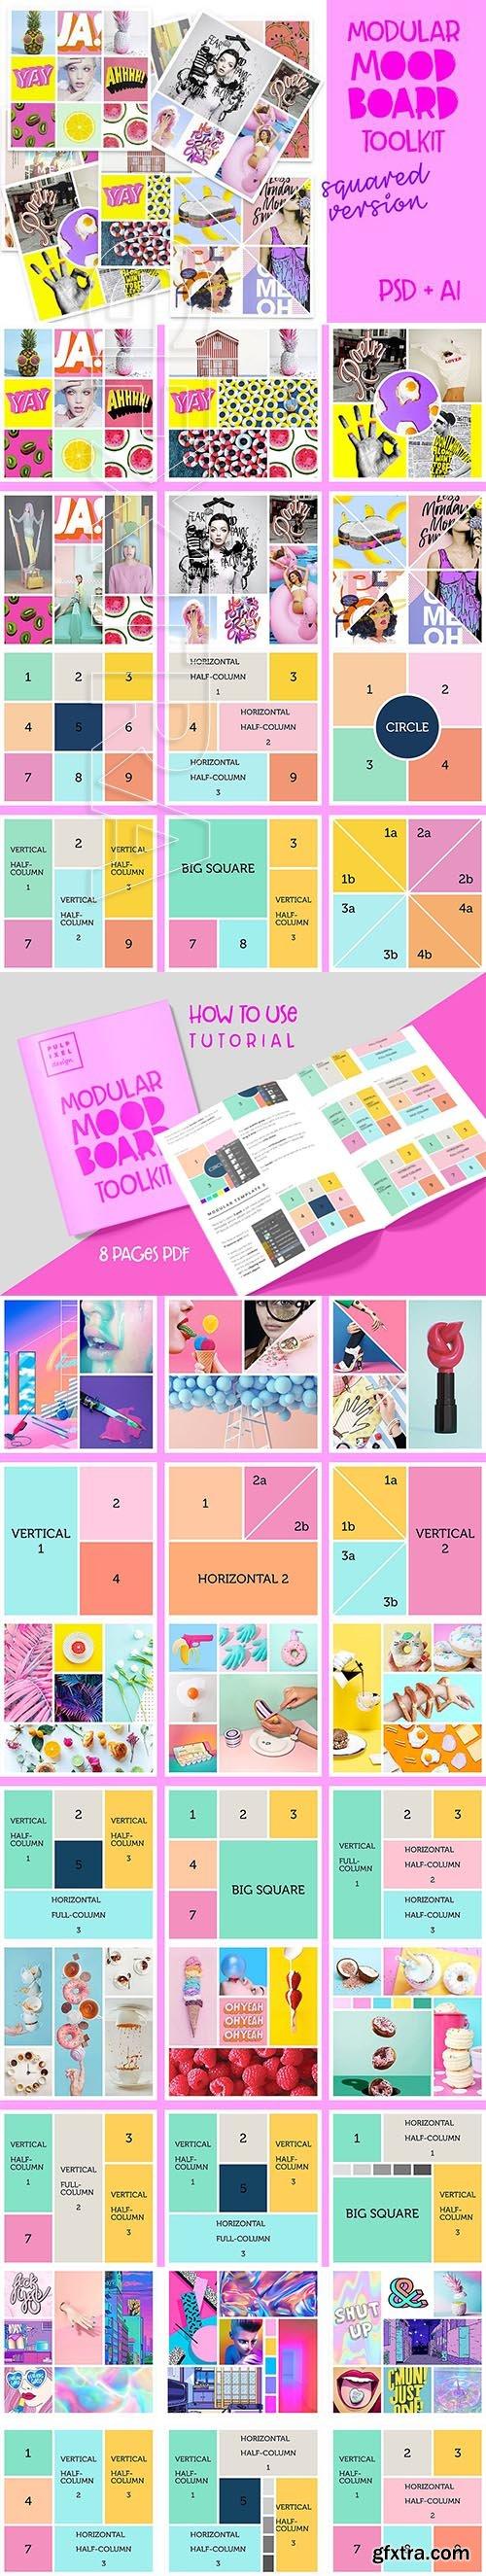 CreativeMarket - Modular Mood Board Toolkit 2737010